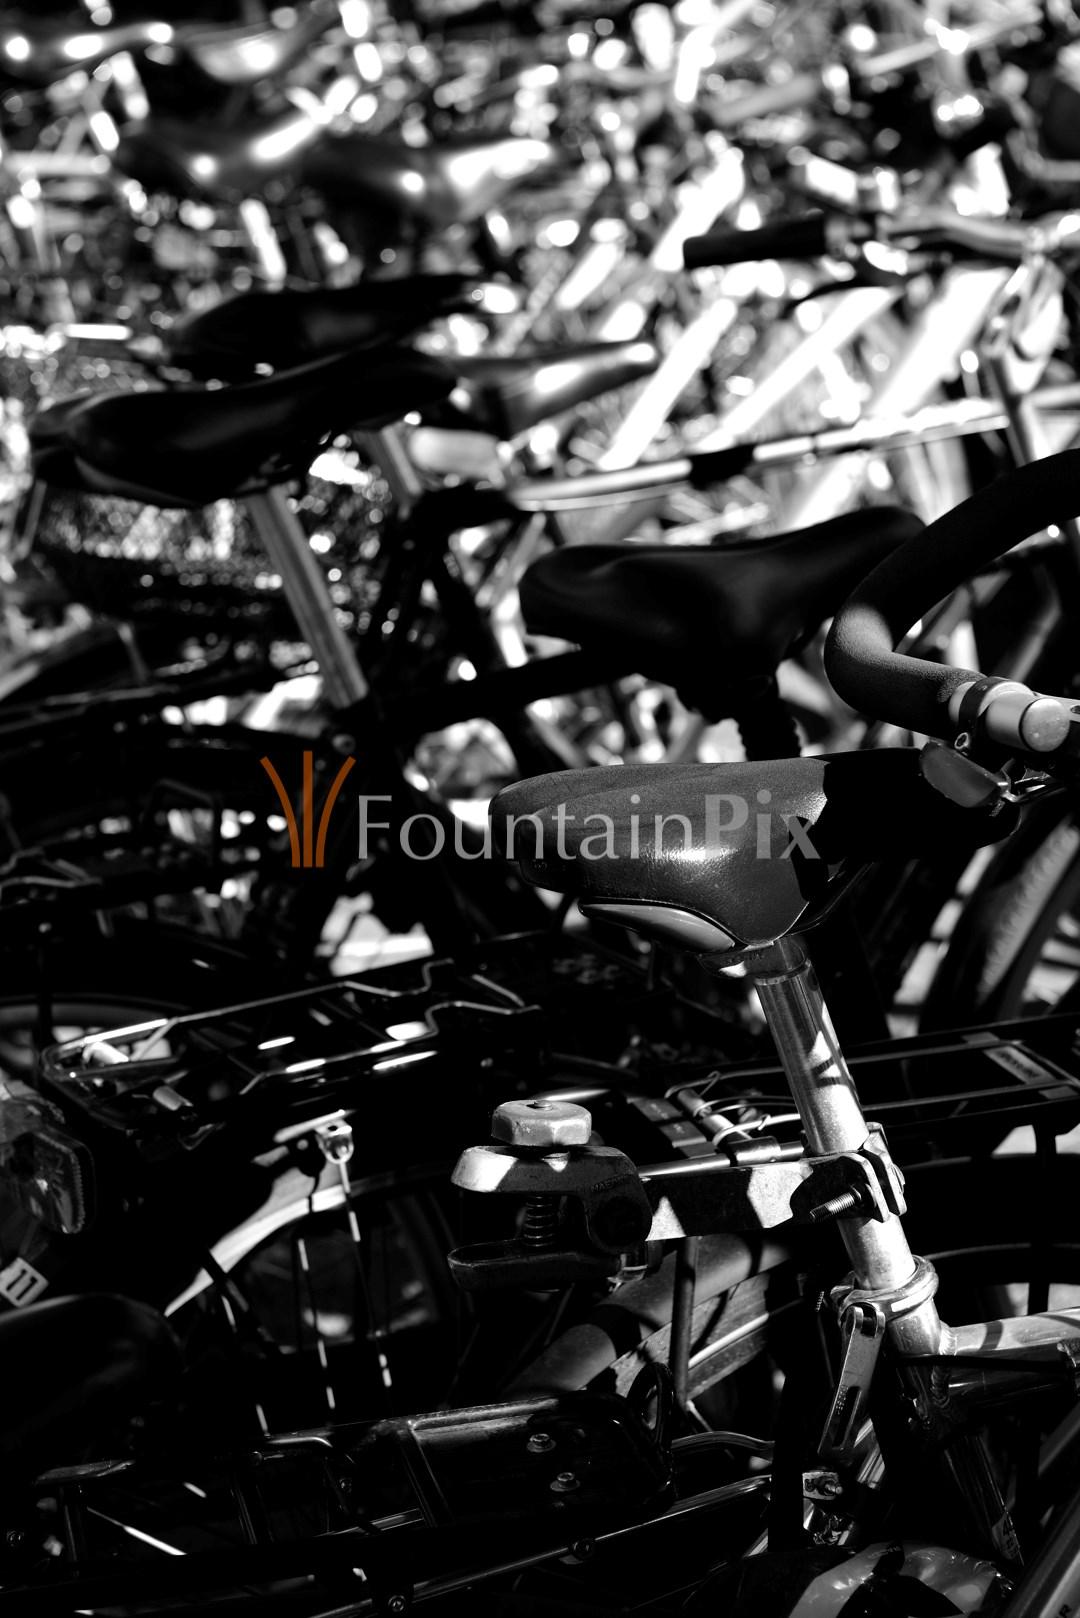 08: Fahrradstadt